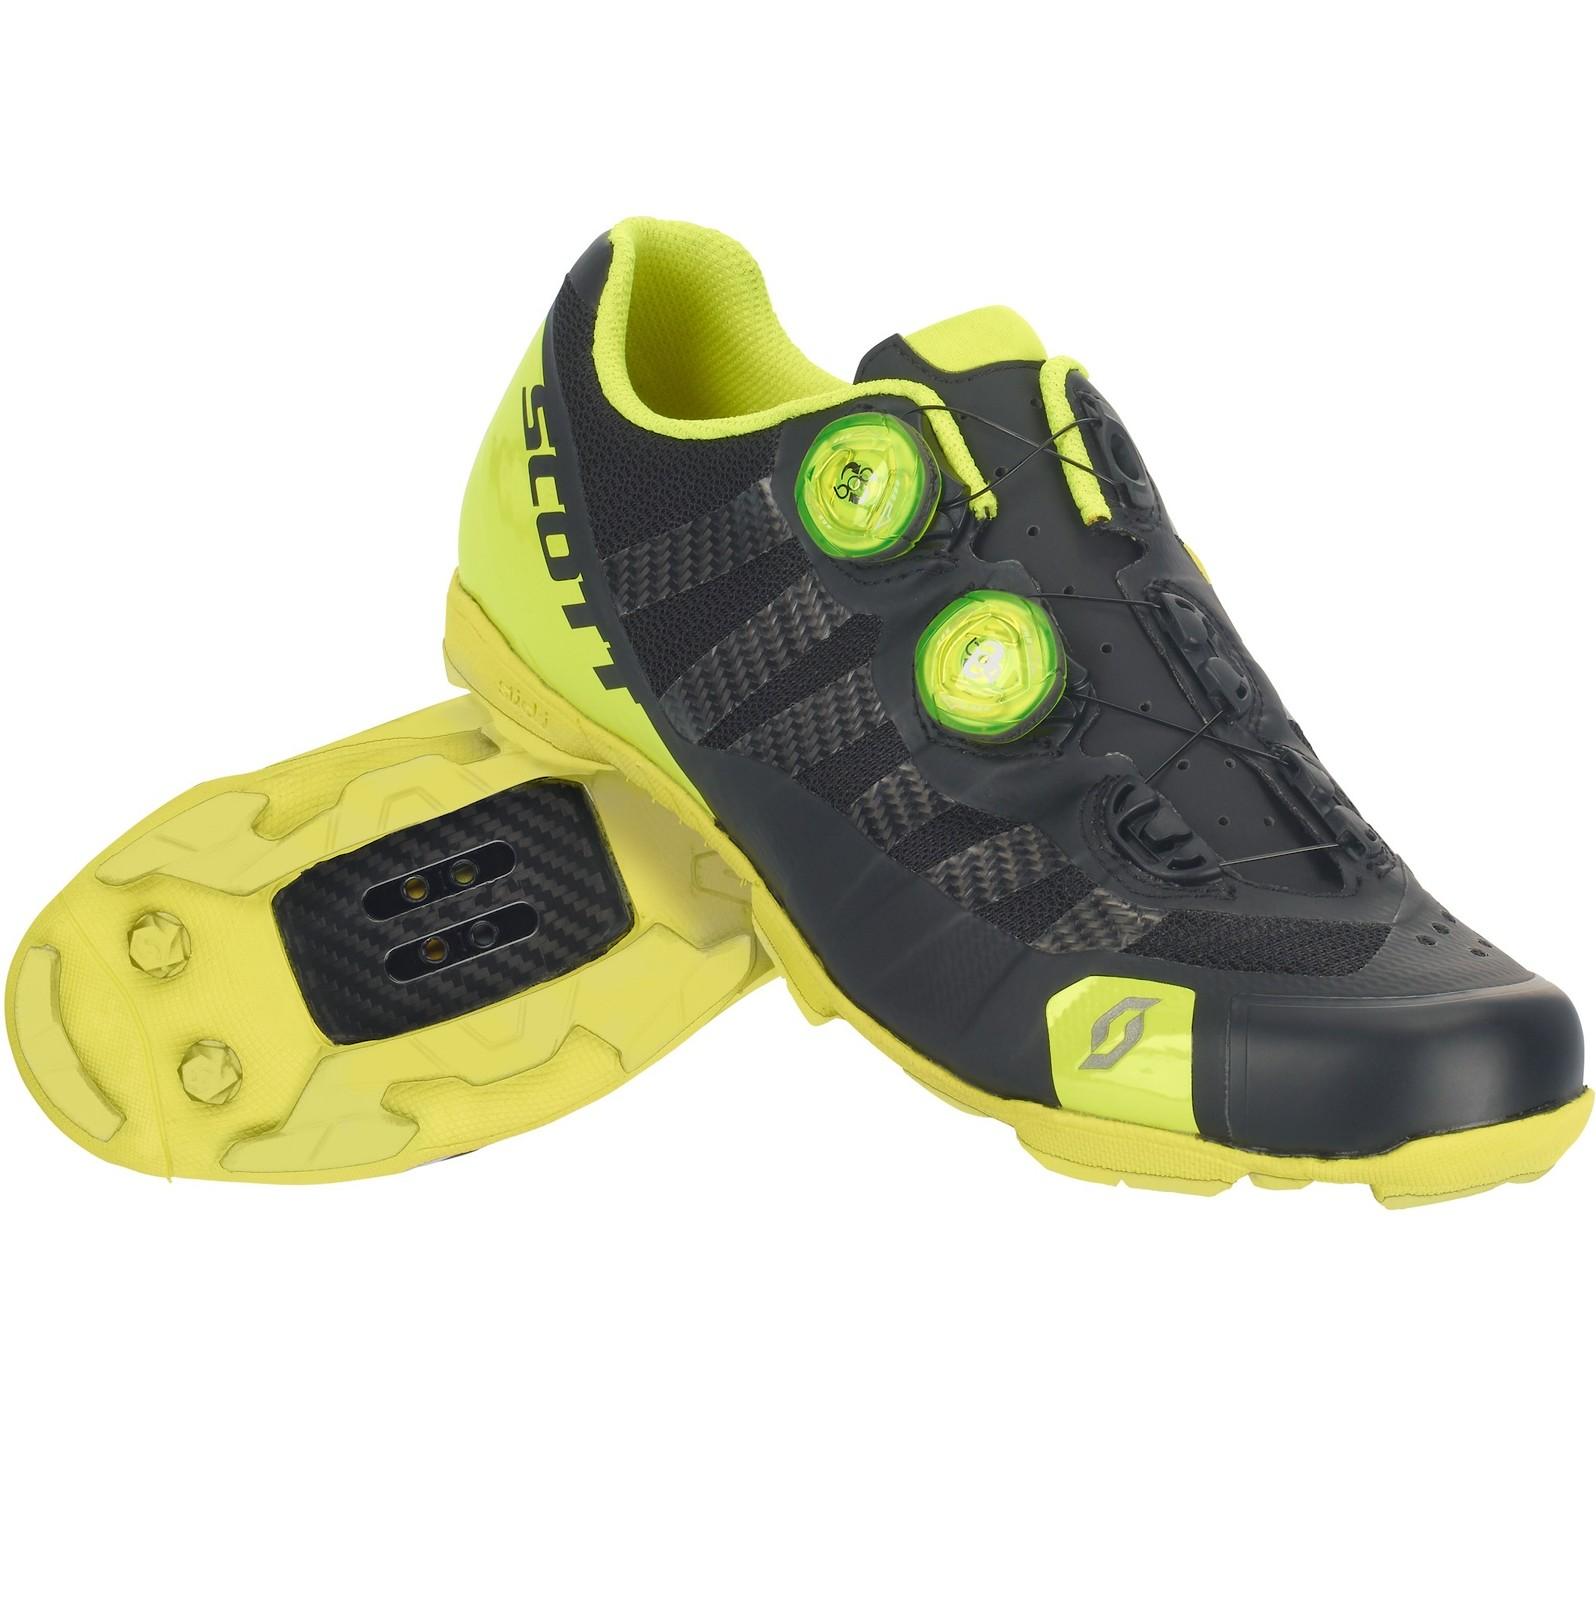 Scott RC Ultimate shoe in matte black/gloss neon yellow